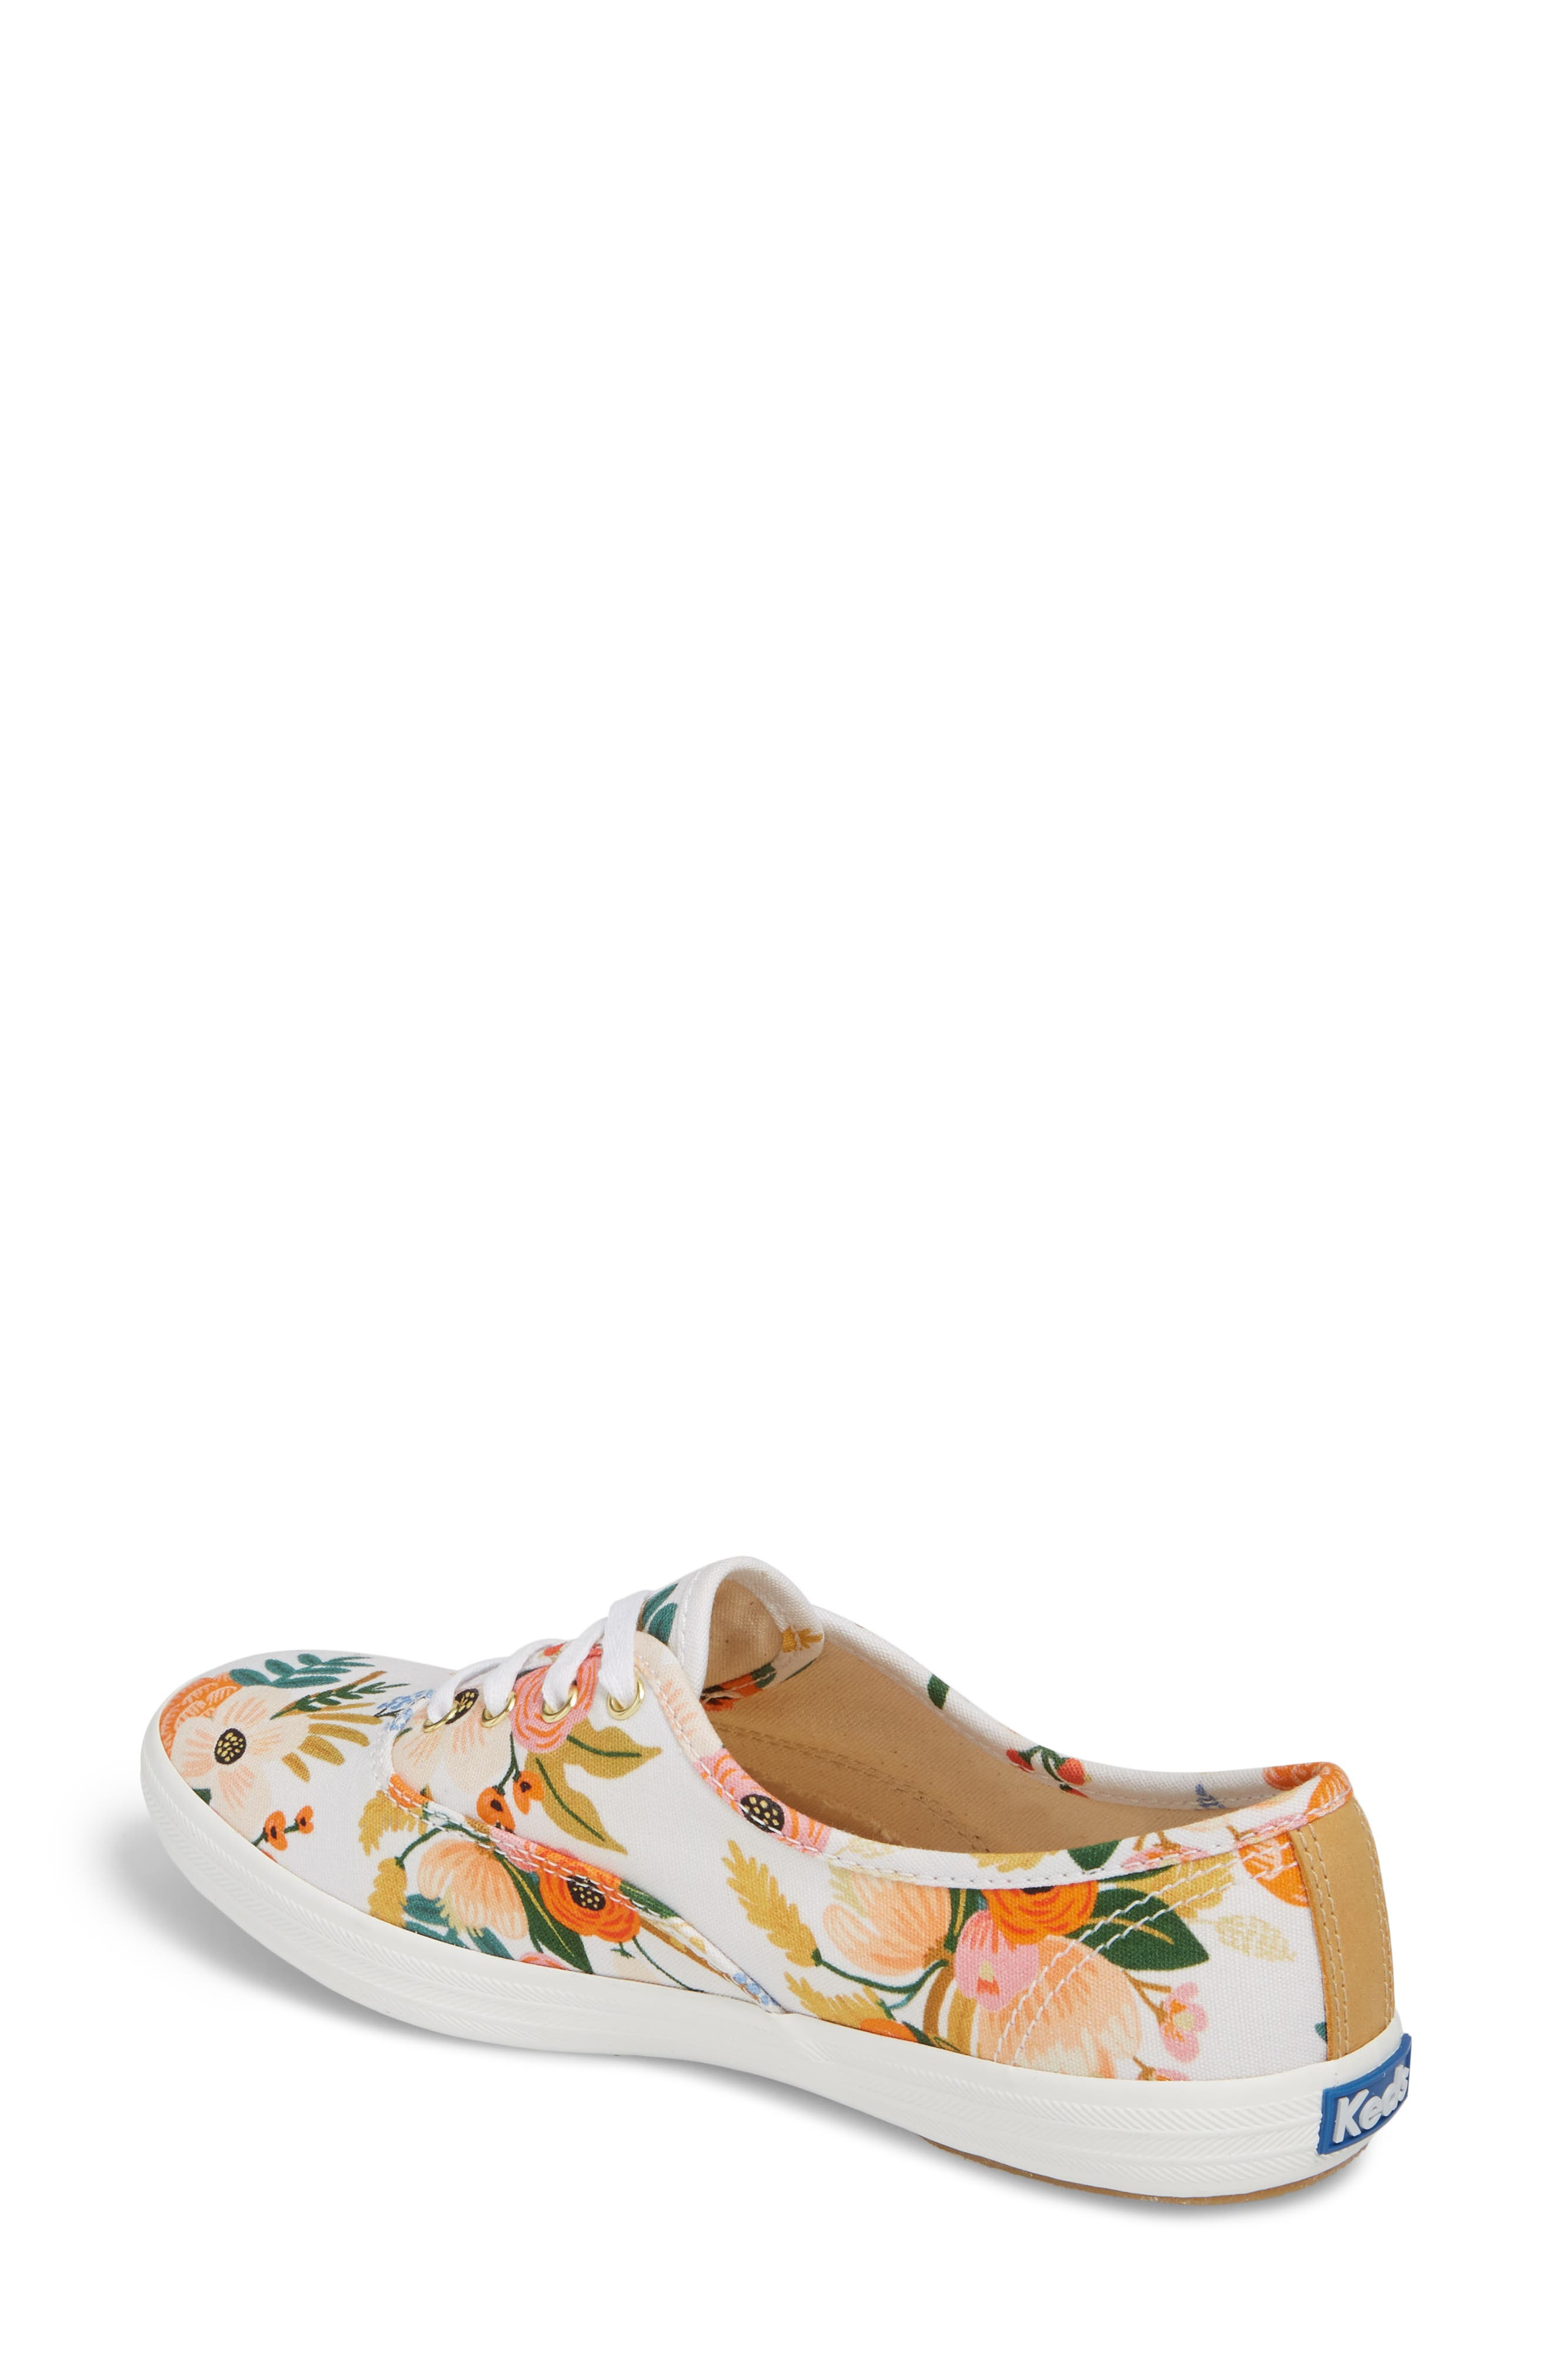 x Rifle Paper Co. Champion Floral Print Sneaker,                             Alternate thumbnail 2, color,                             White